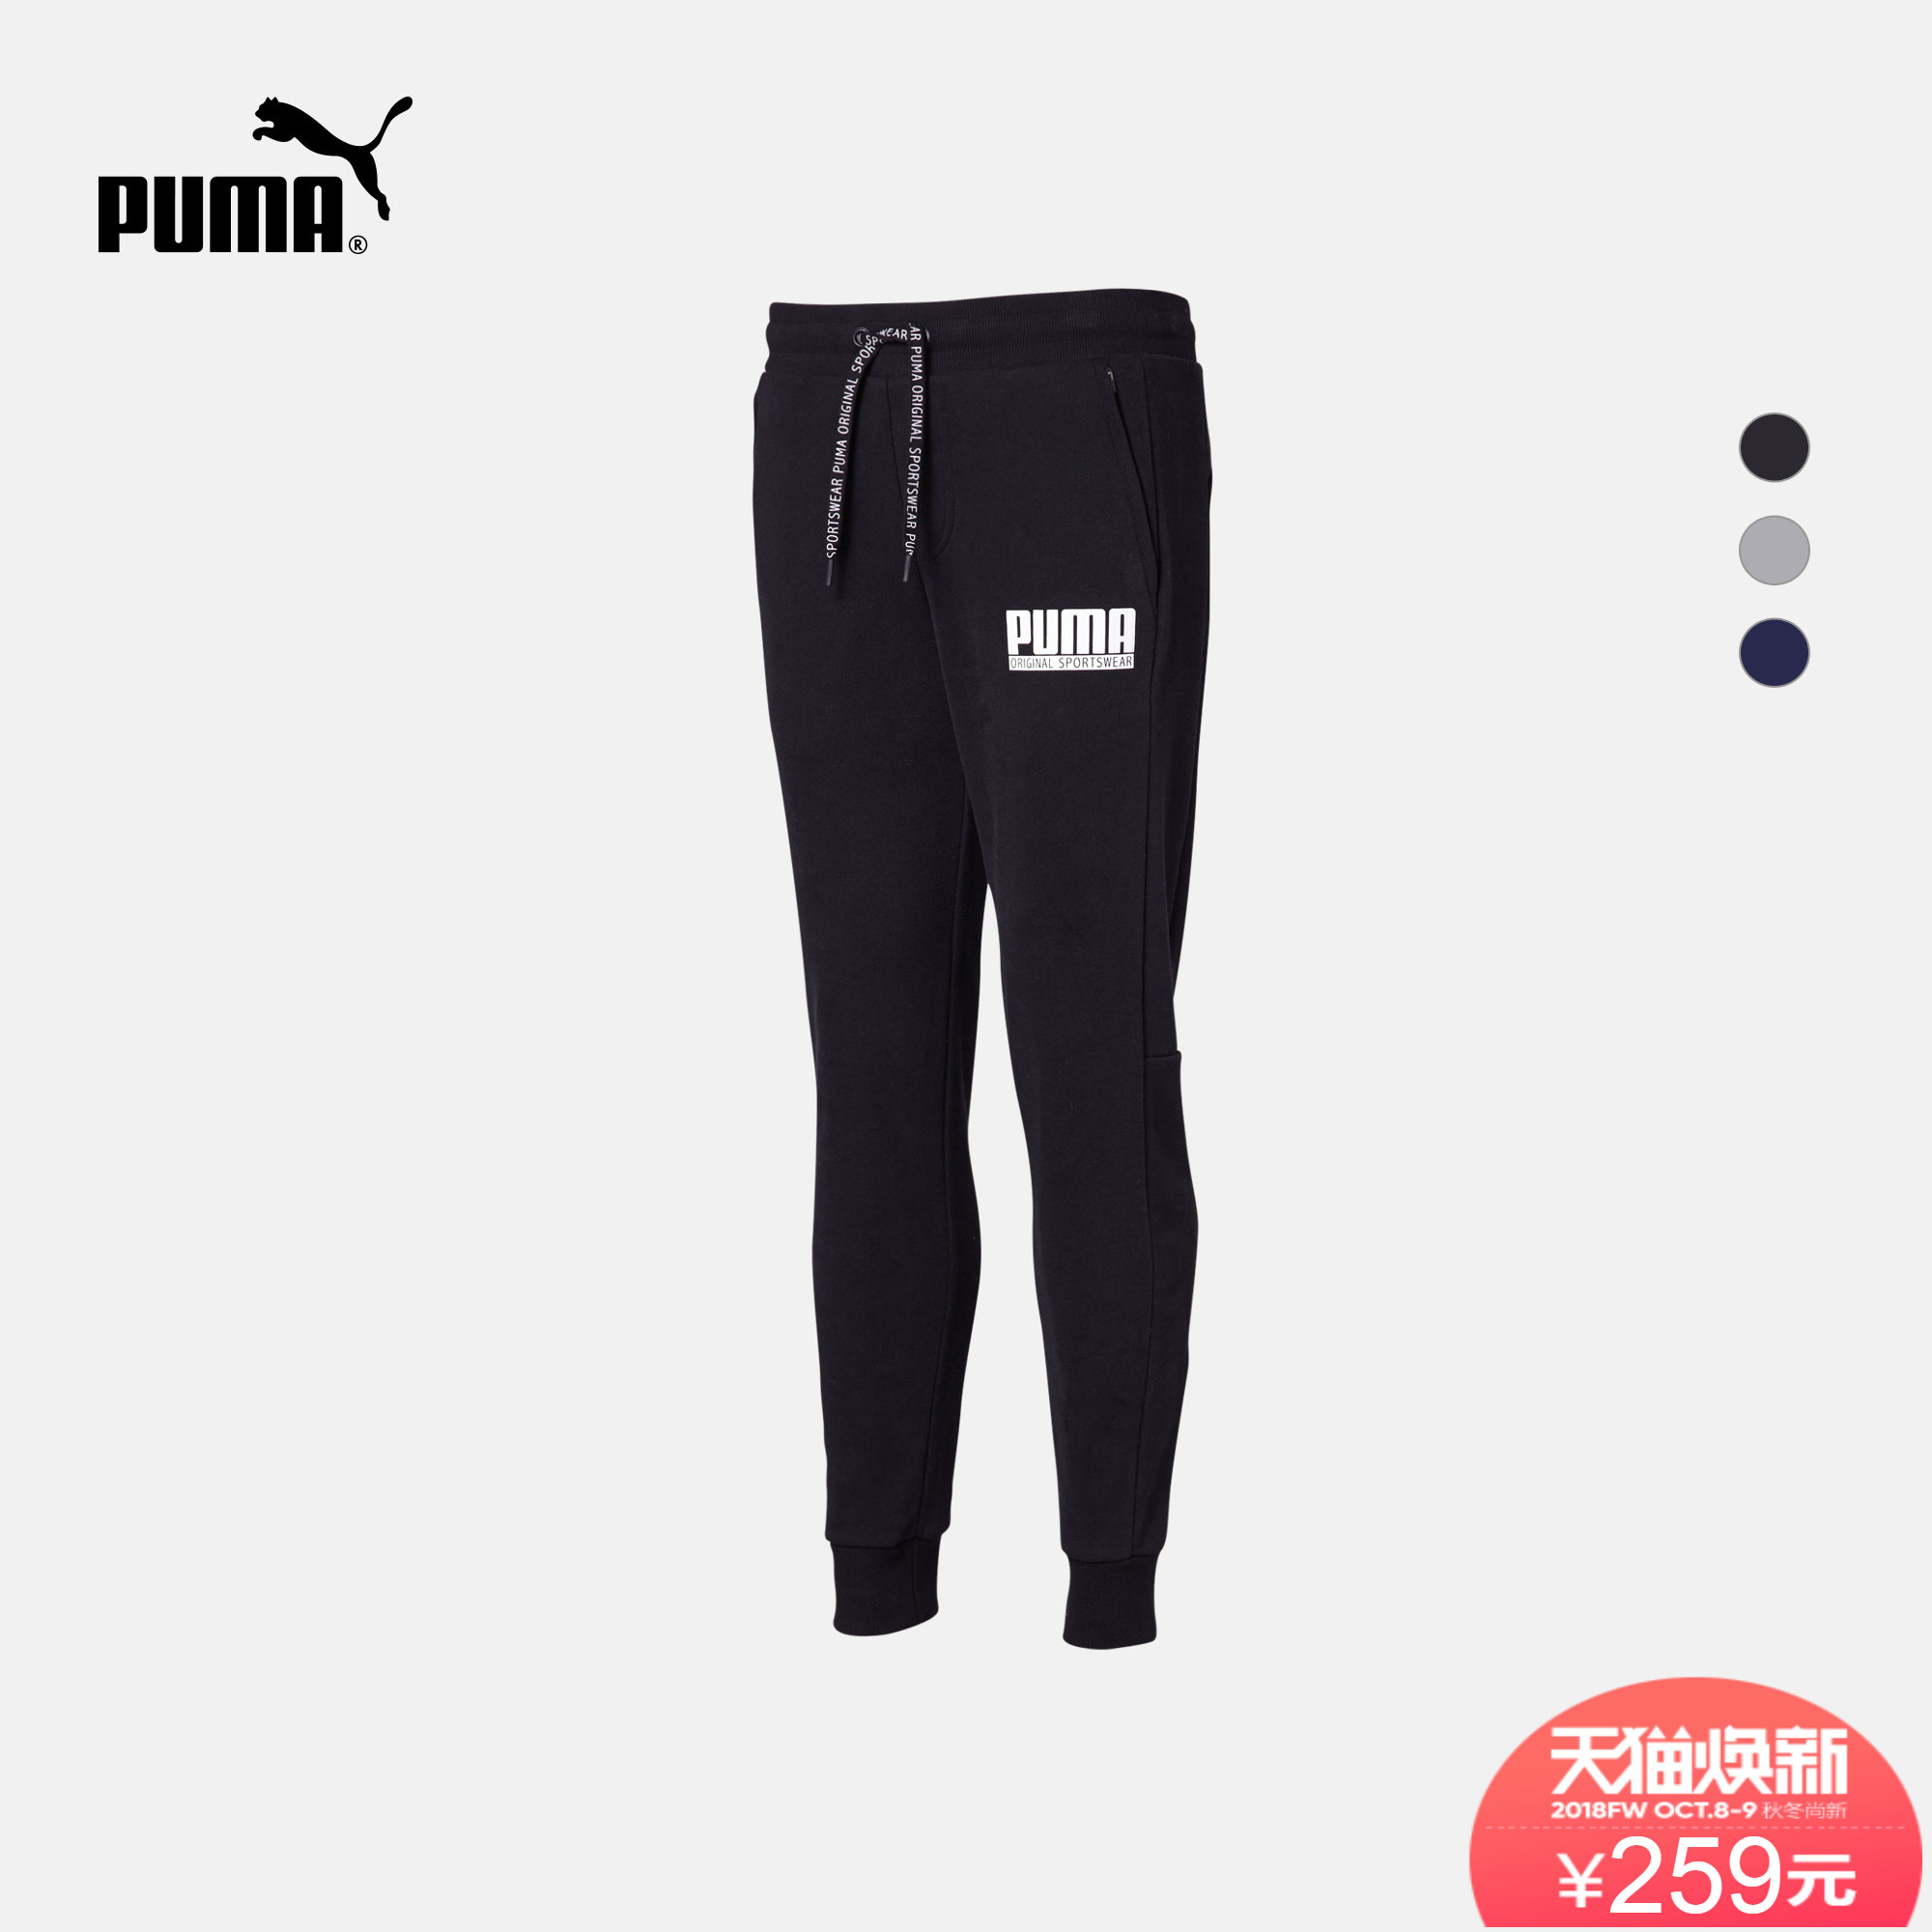 PUMA彪马官方 男子抽绳针织长裤 STYLE Athletics 852011